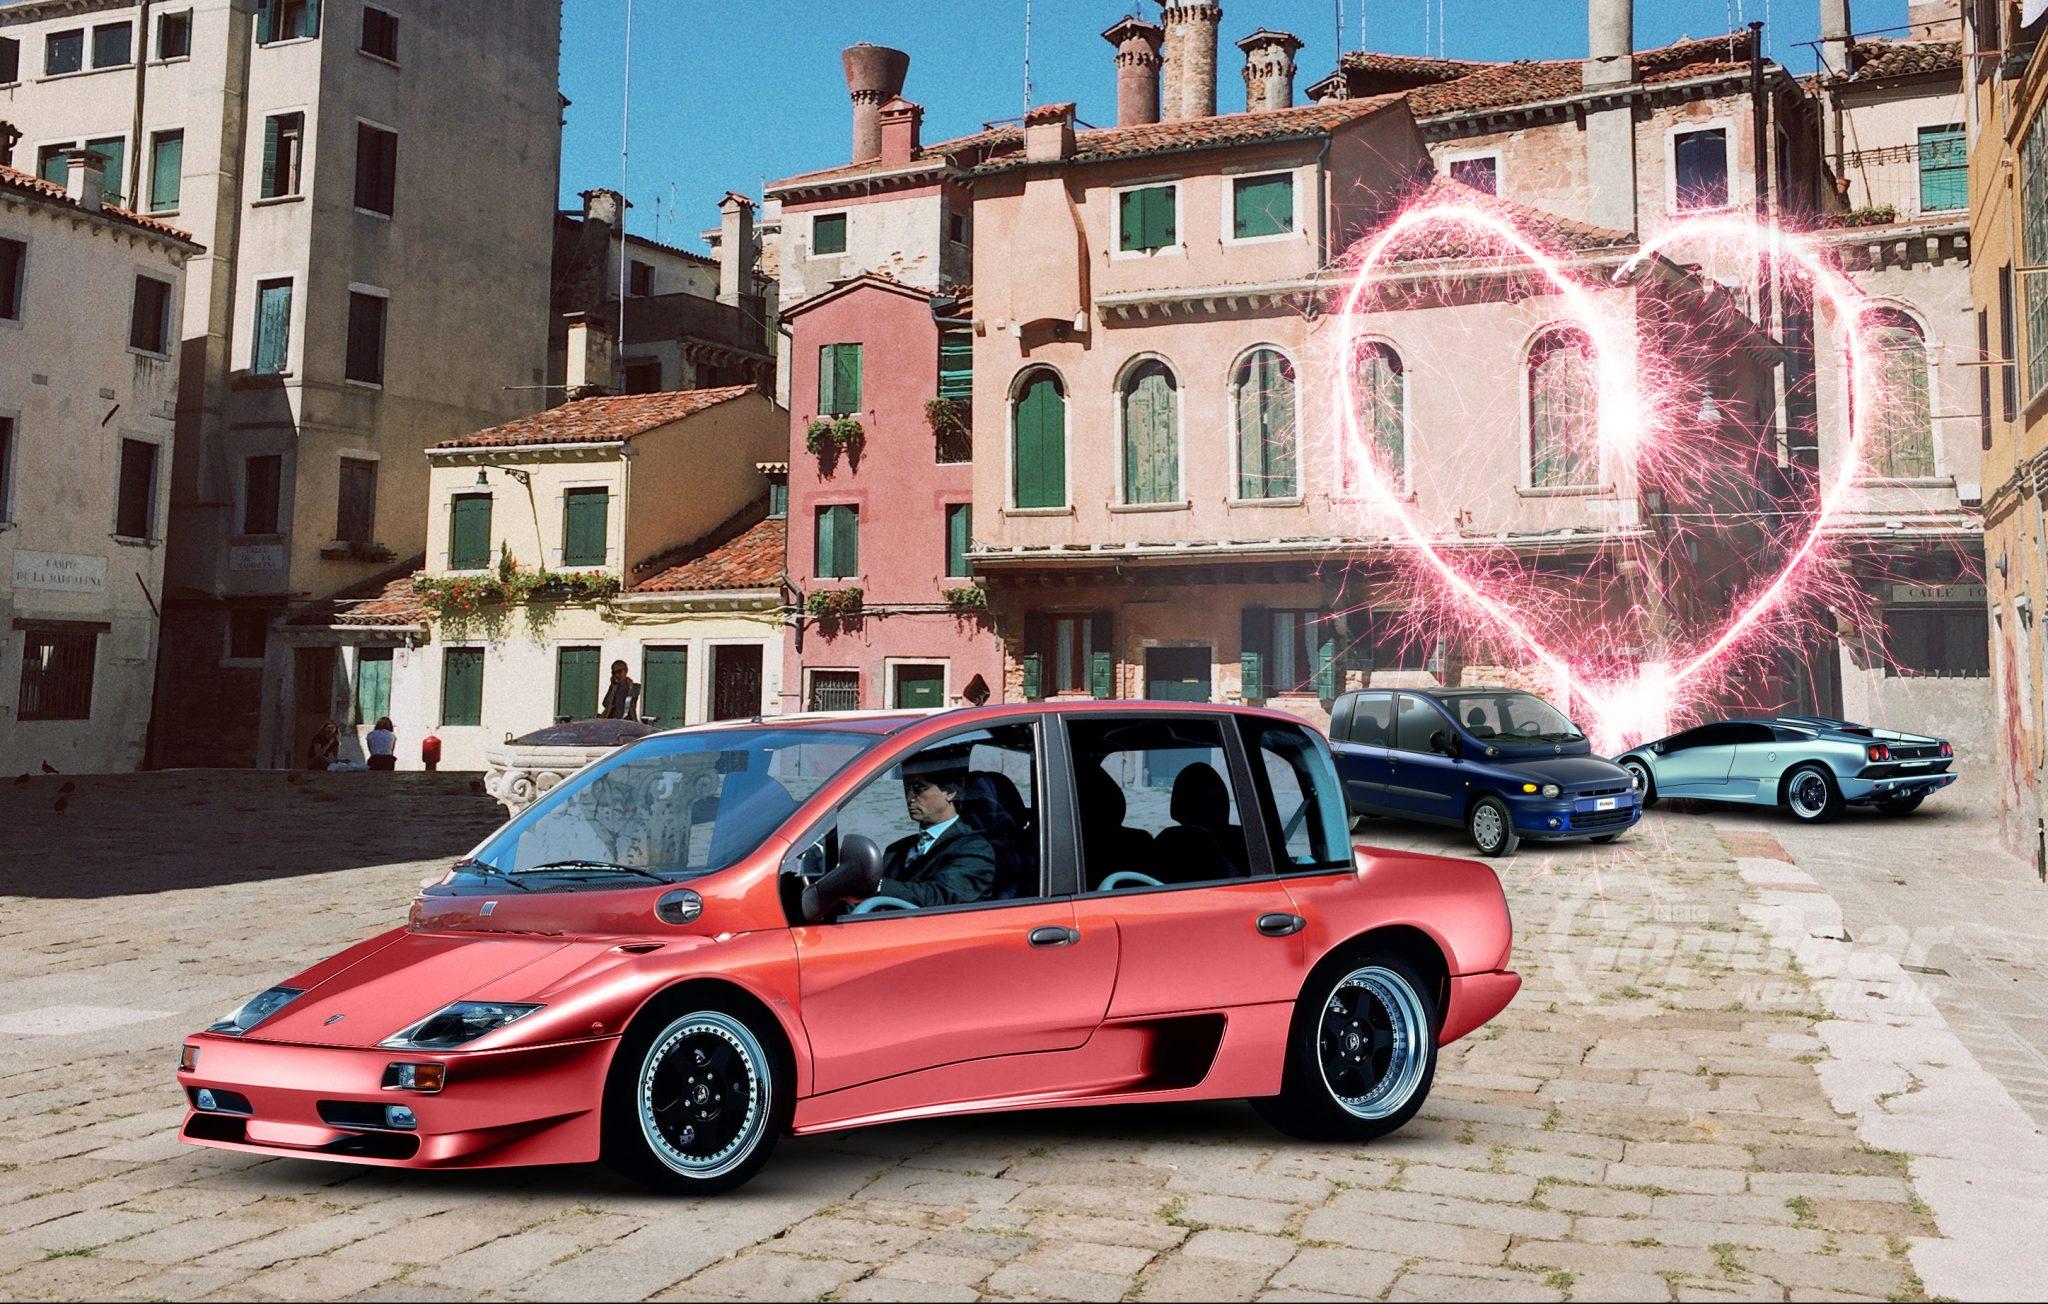 TGNL Autoliefdesbaby Lamborghini Diablo x Fiat Multipla